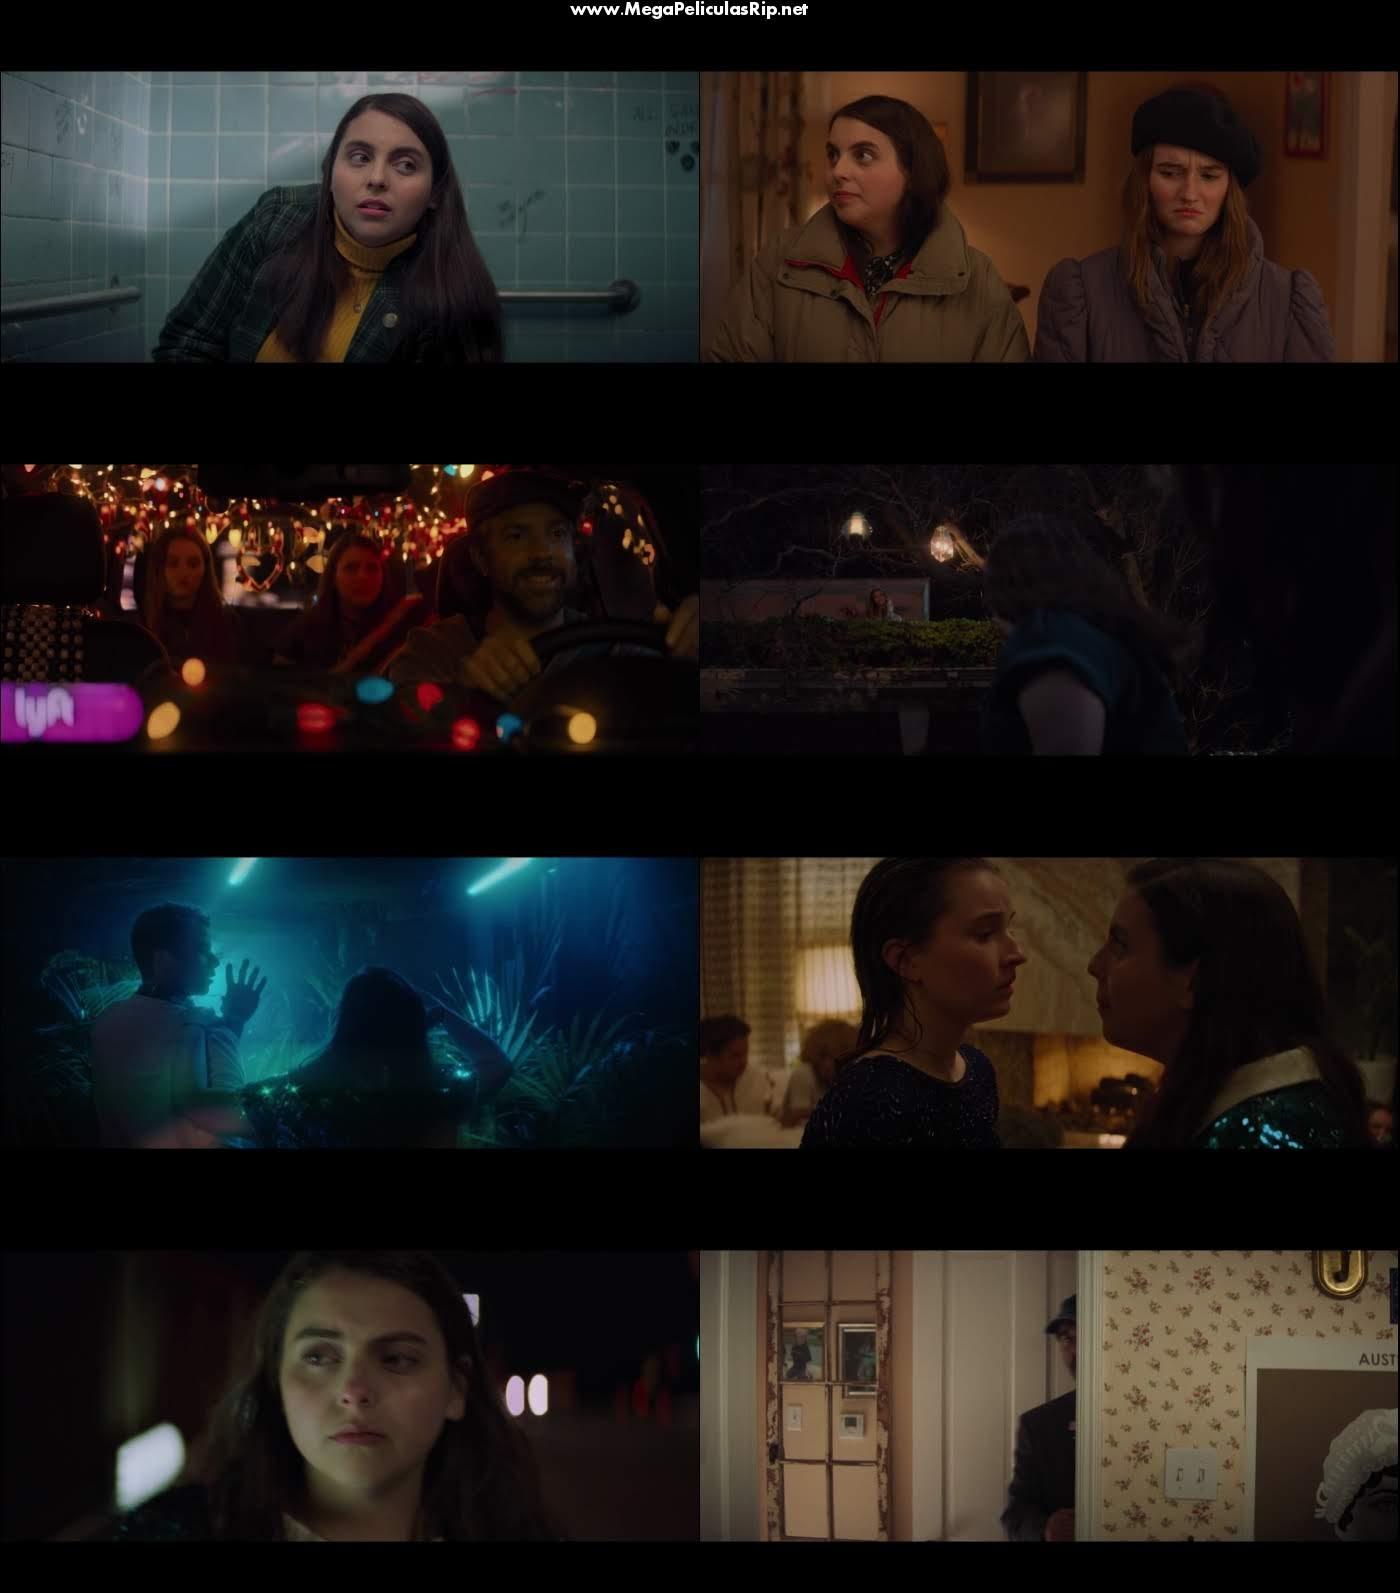 La Noche De Las Nerds 1080p Latino